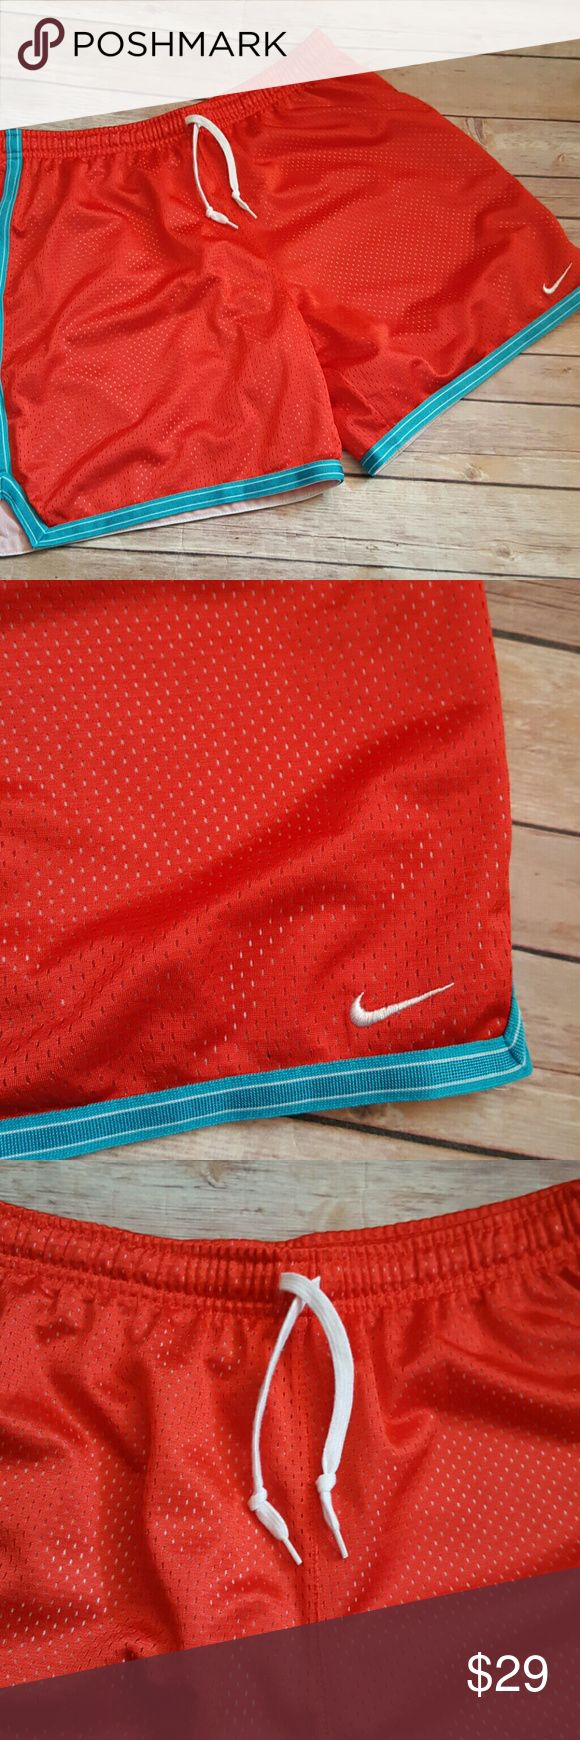 "Womens Basketball Shorts Size Medium 8 10 Red Blue Very gently worn Length 16.5"" Waist 15.5"" Nike Shorts"